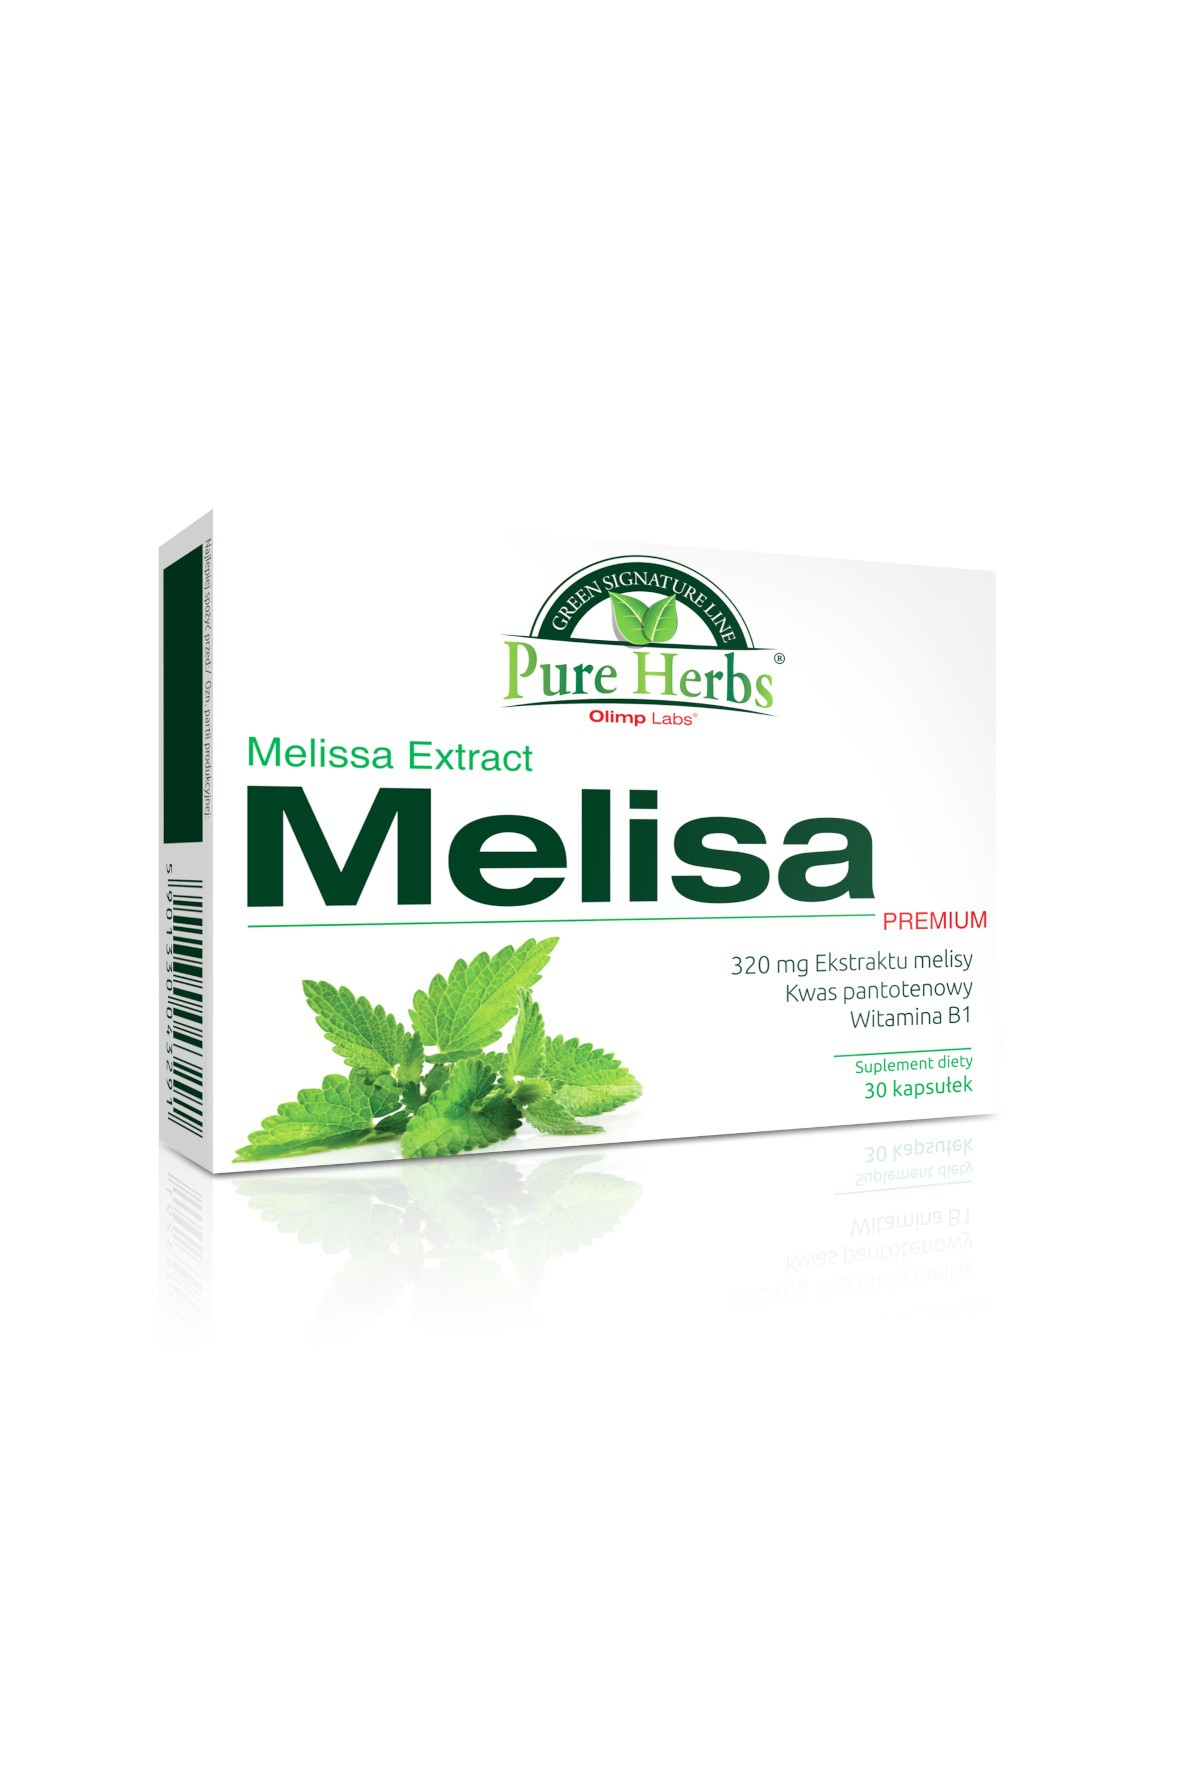 Melisa Premium 30 kapsułek